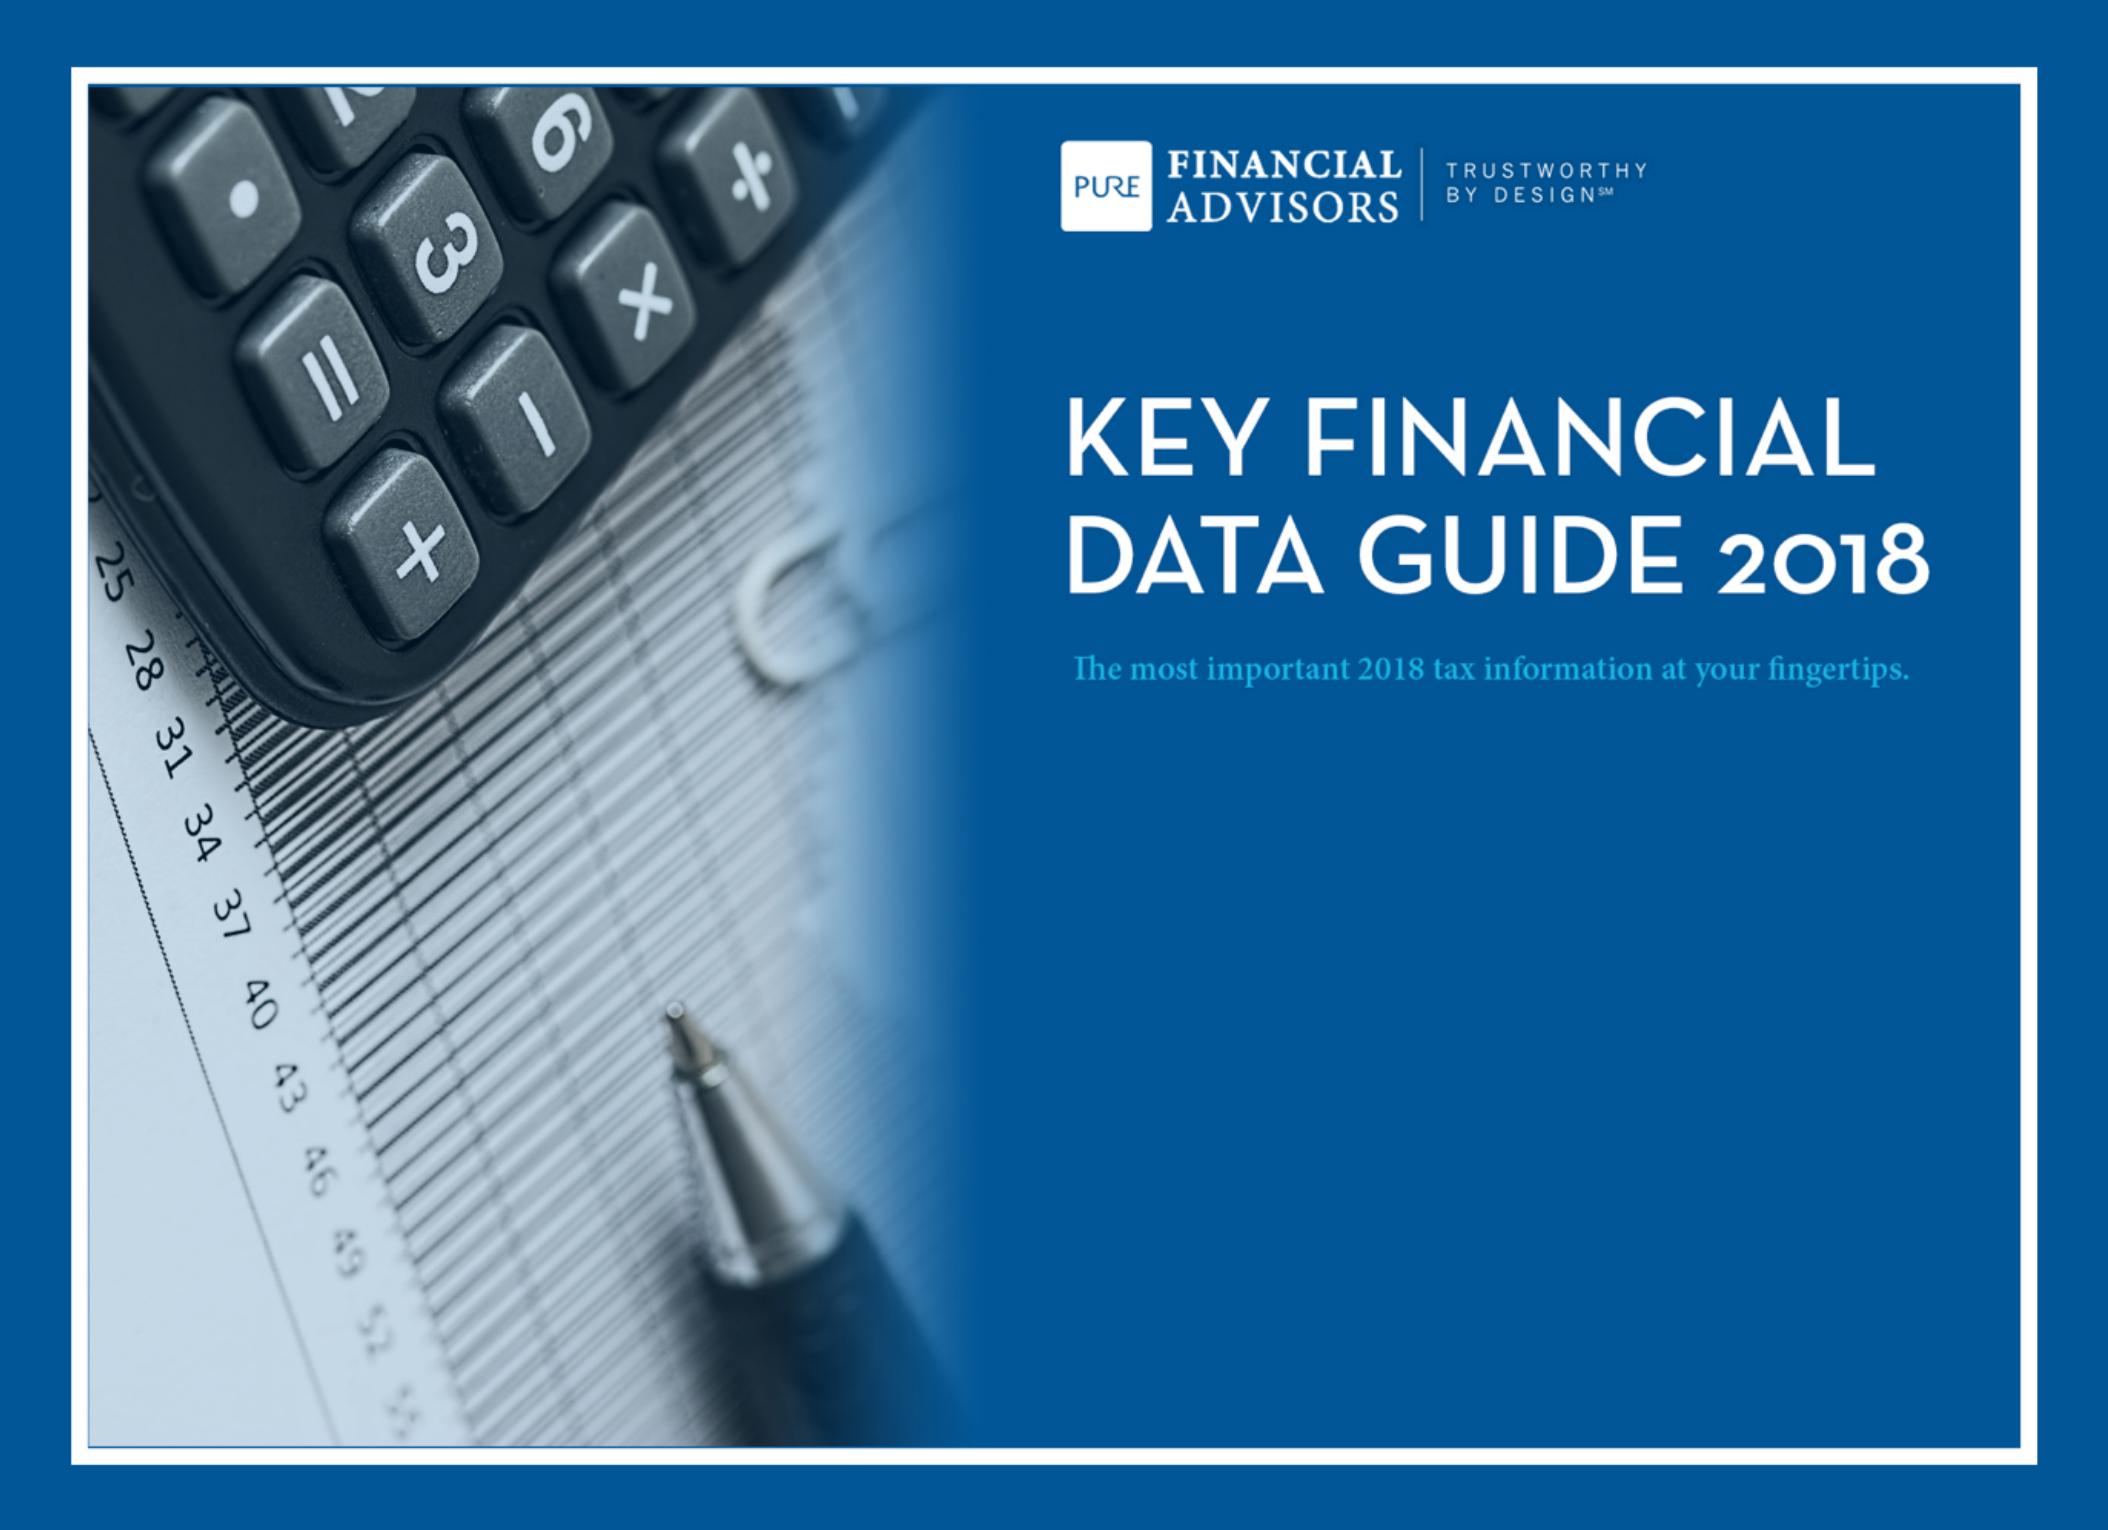 Key Financial Data